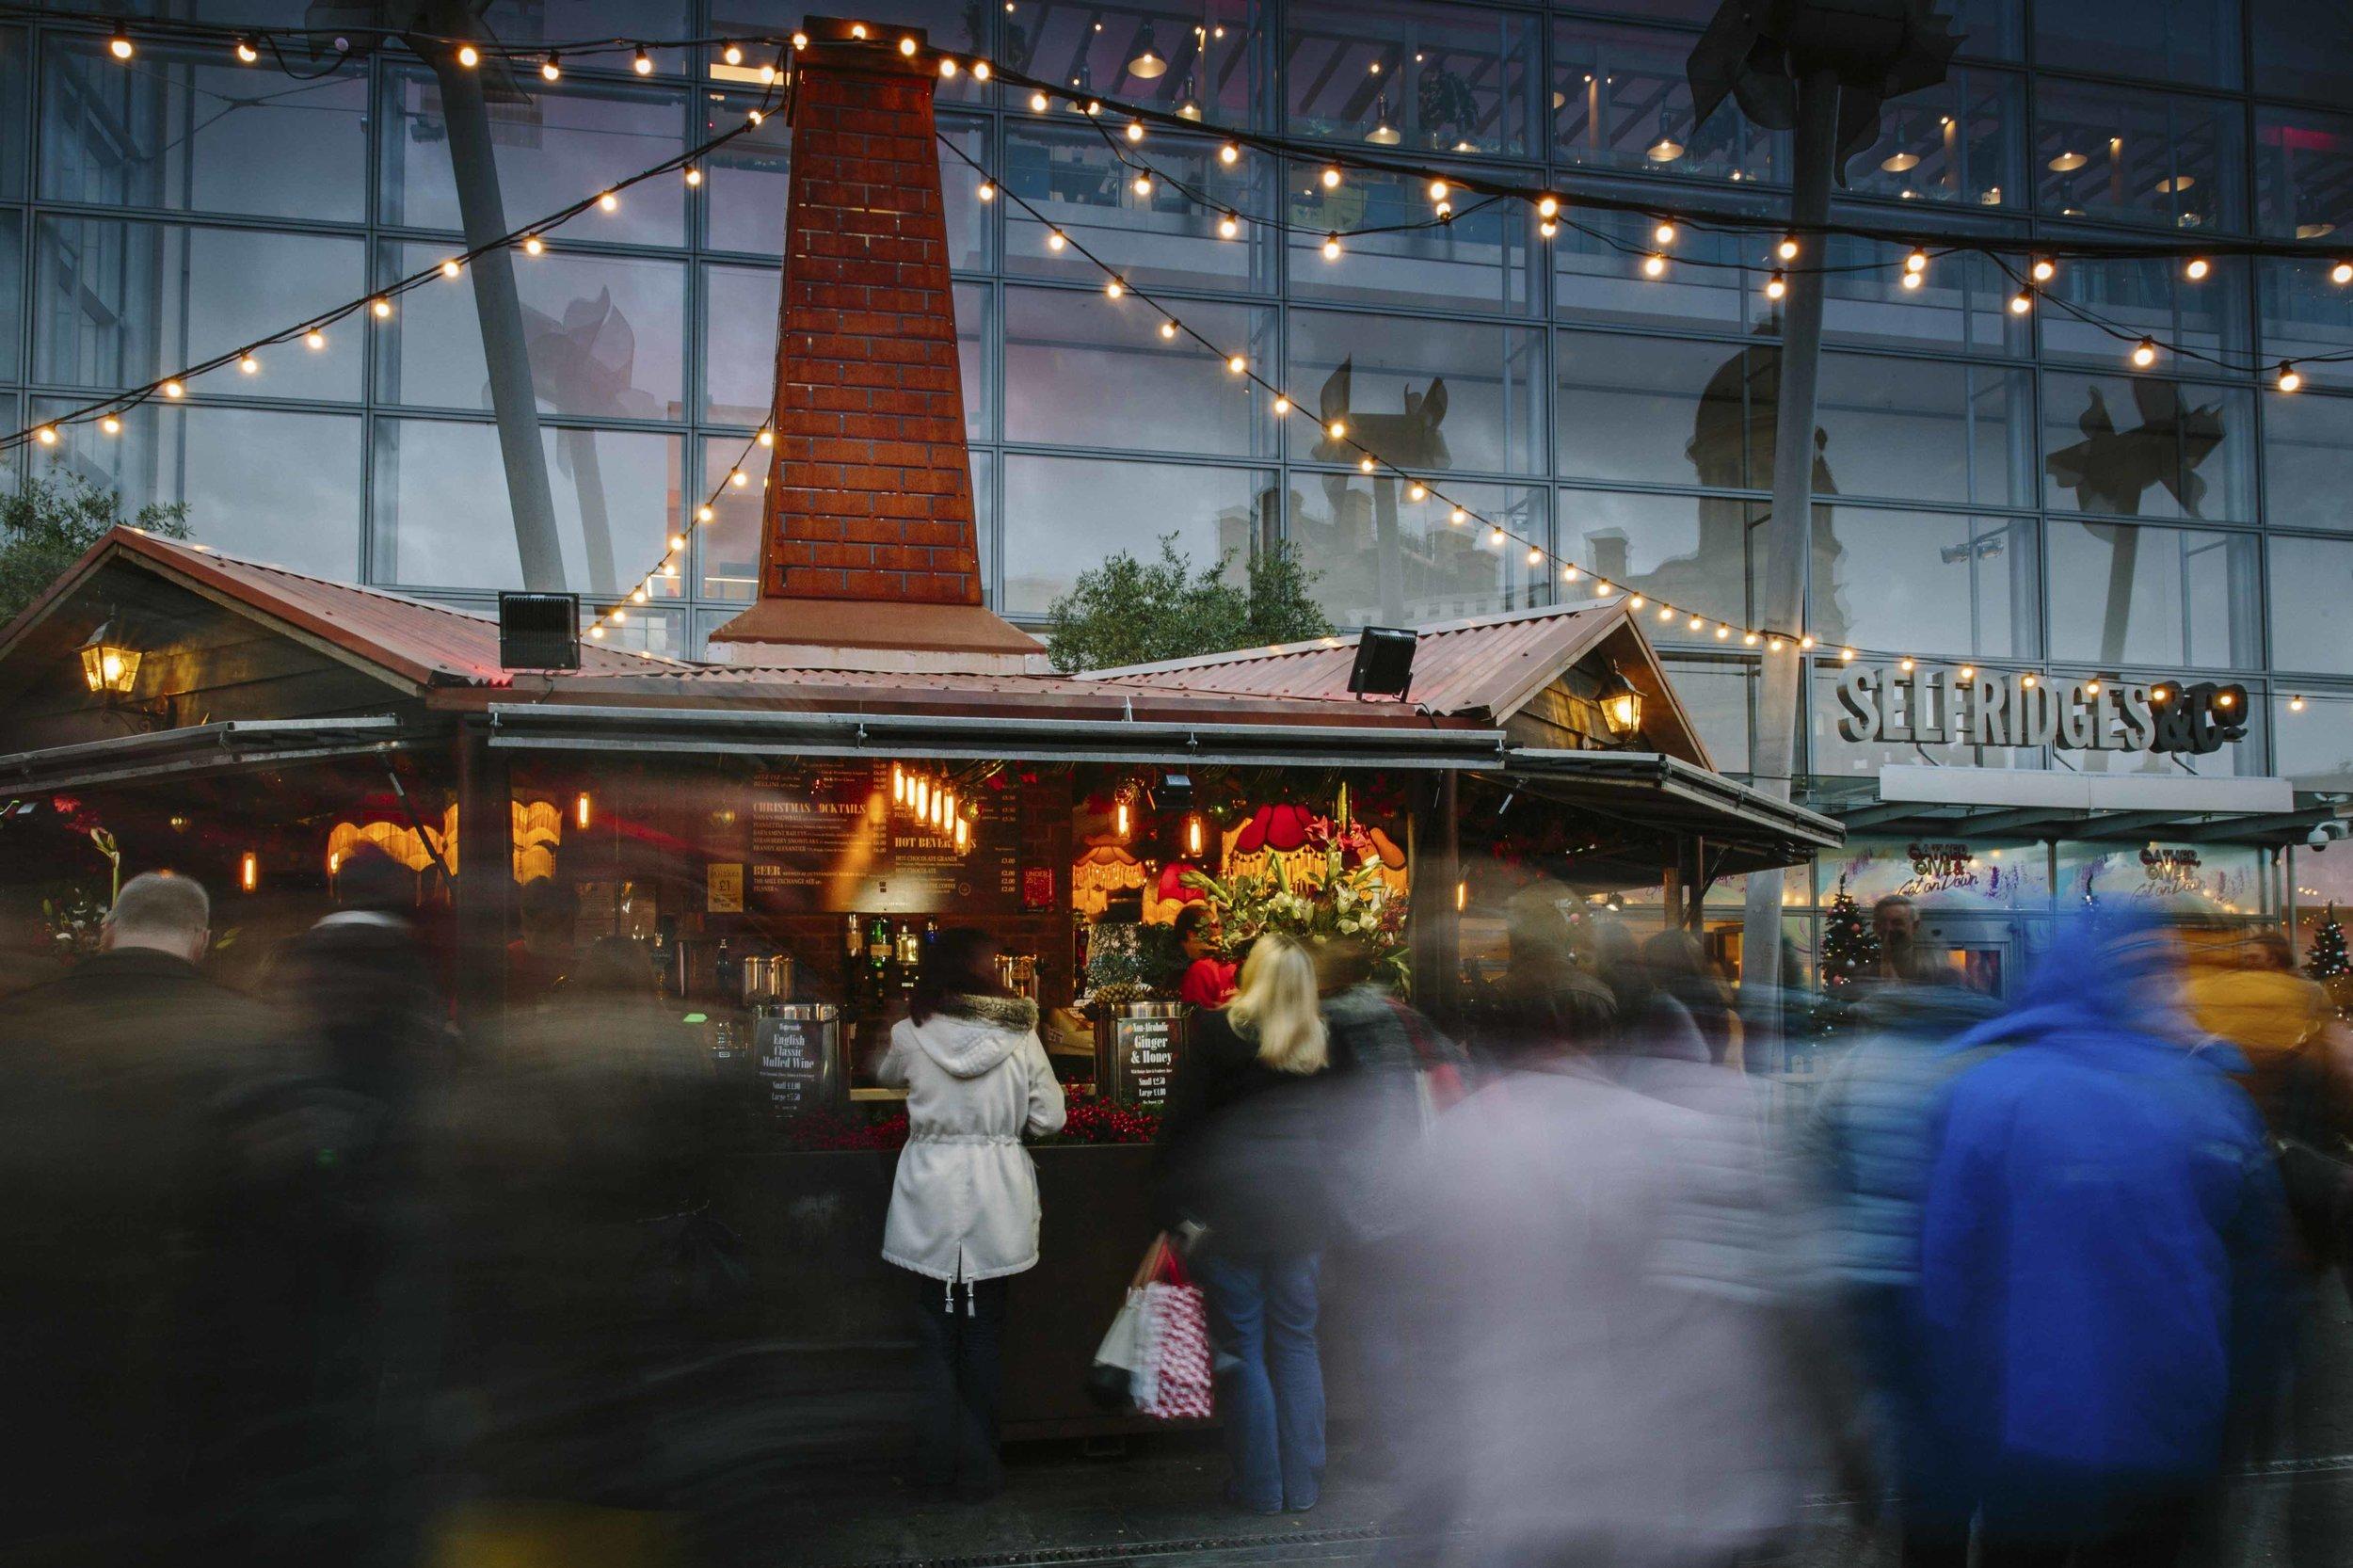 DP_Structures_Manchester_Christmas_Markets_2016_11.jpg